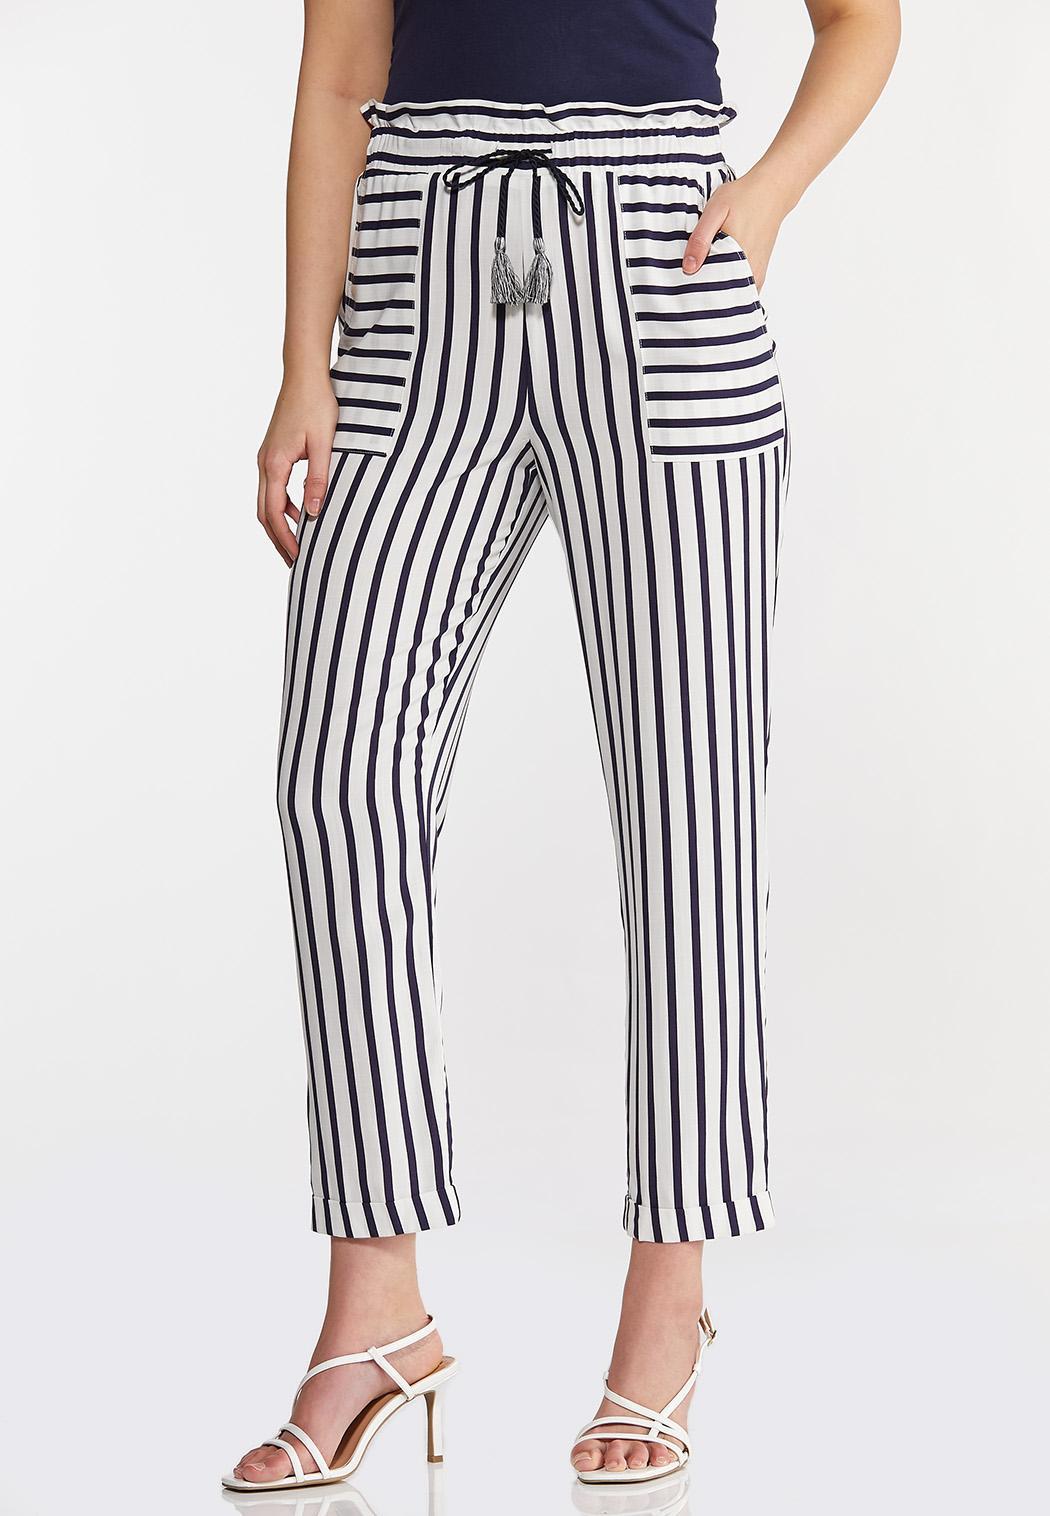 Stripe Tassel Tie Pants